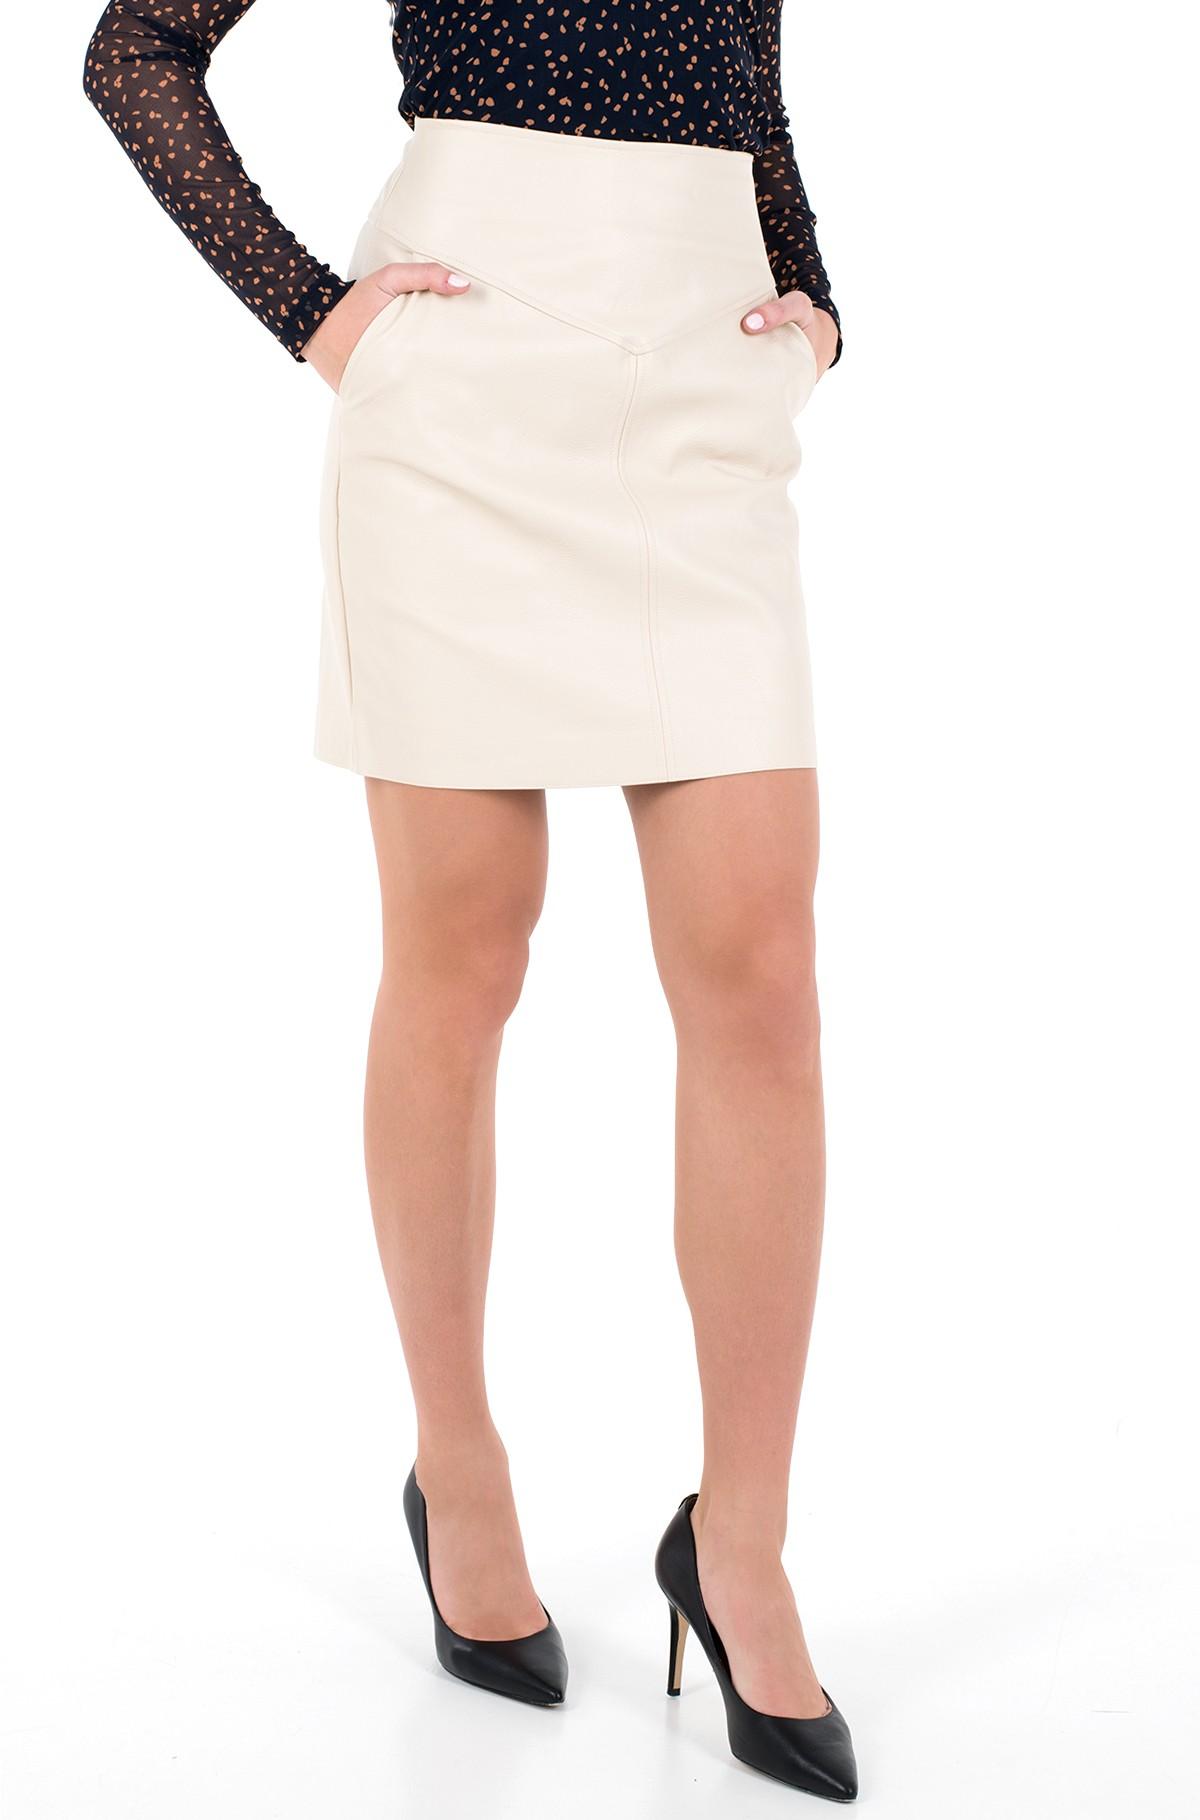 Leather skirt PEPA/PL900881-full-1